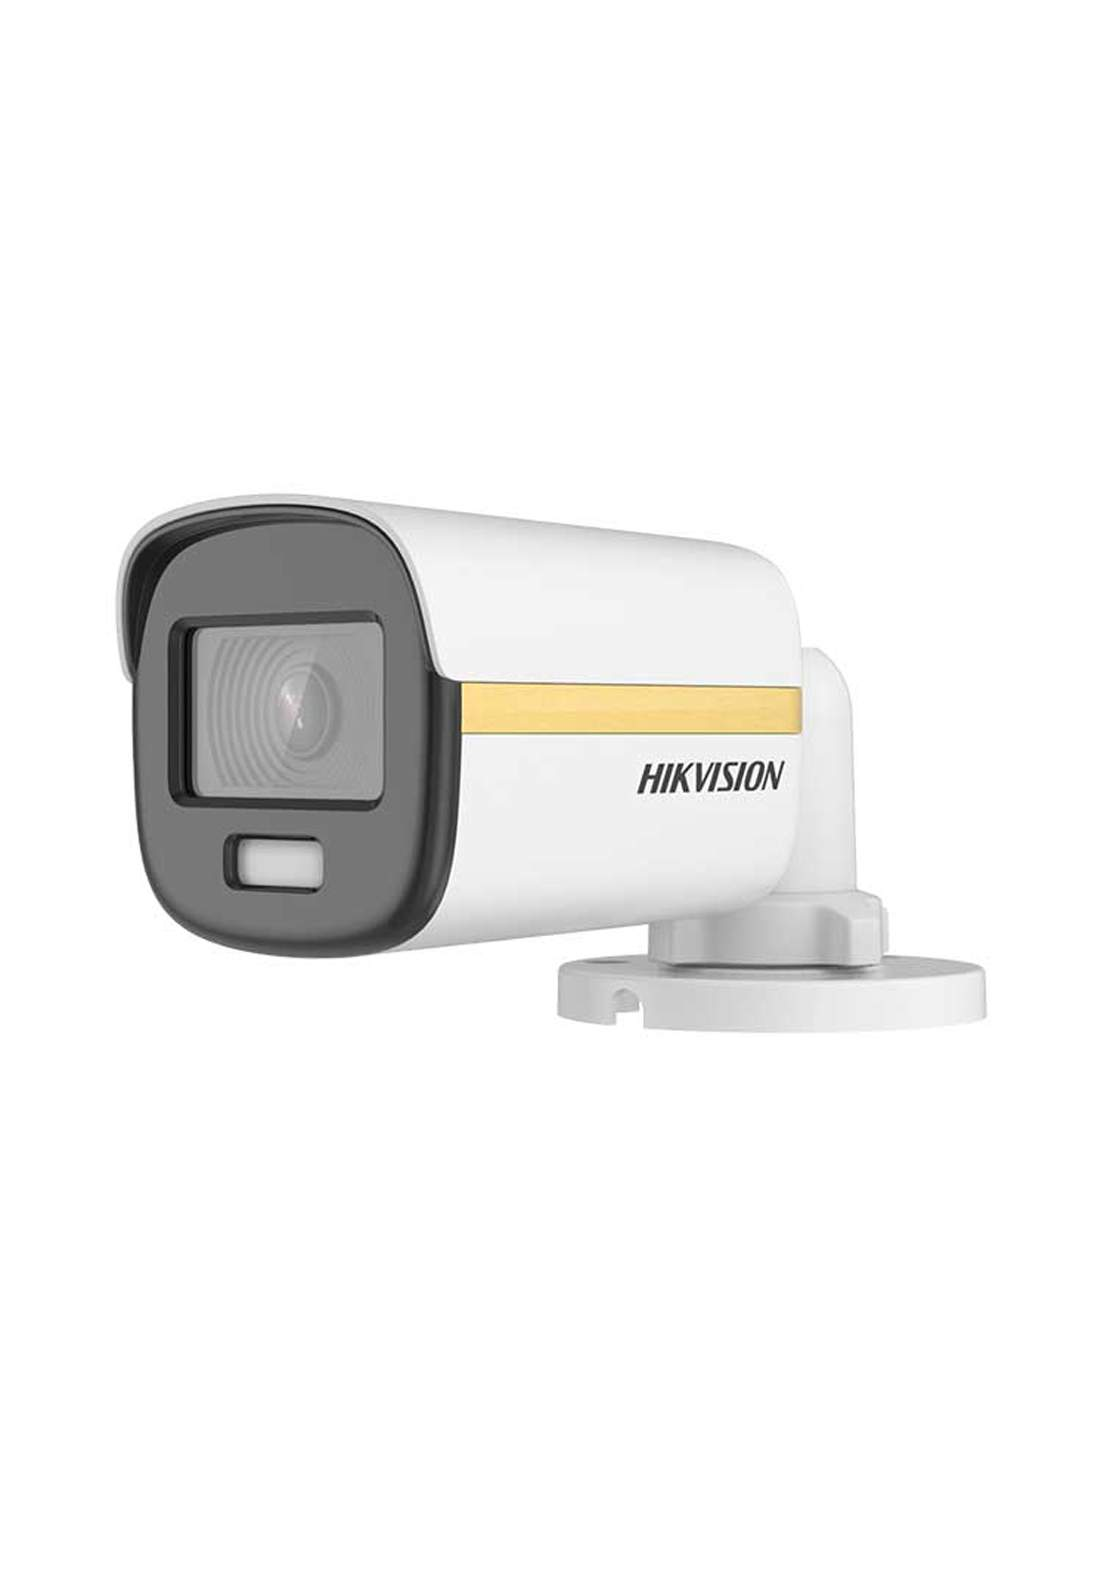 Hikvision 2mp ColorVu Fixed Mini Bullet Camera Ds-2ce10df3t-Pf  - White